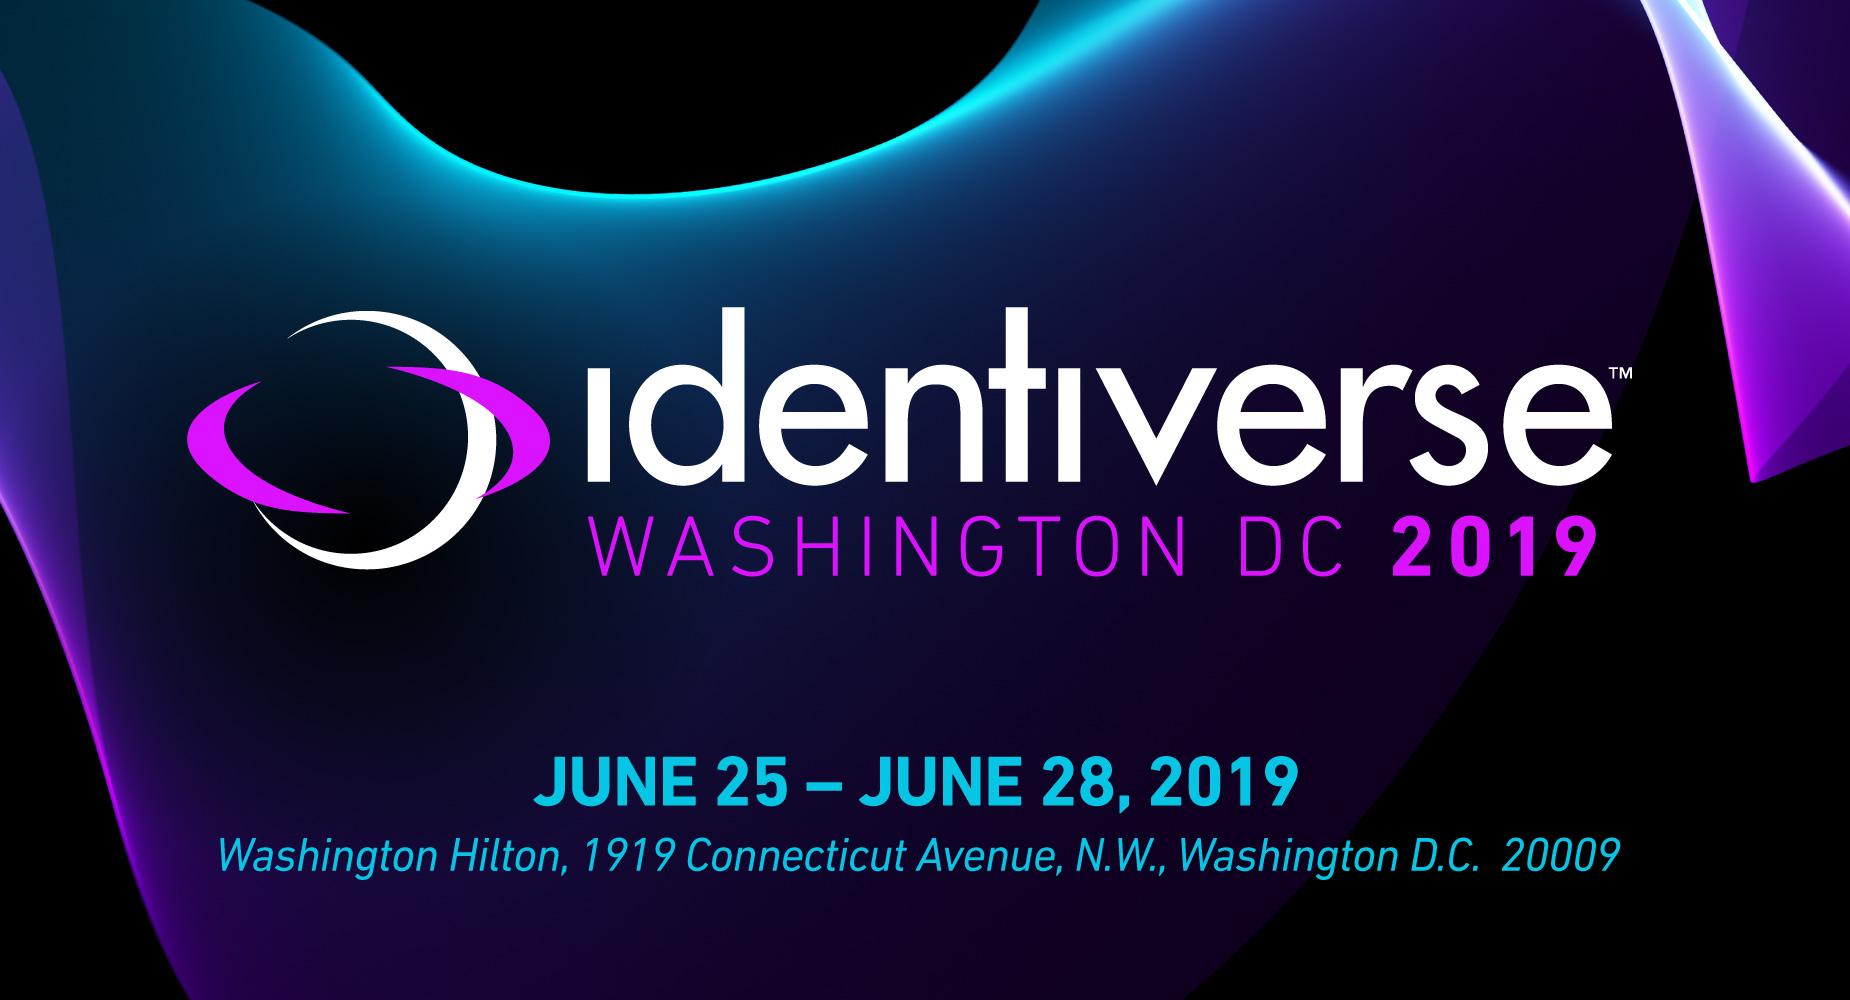 Identiverse 2019